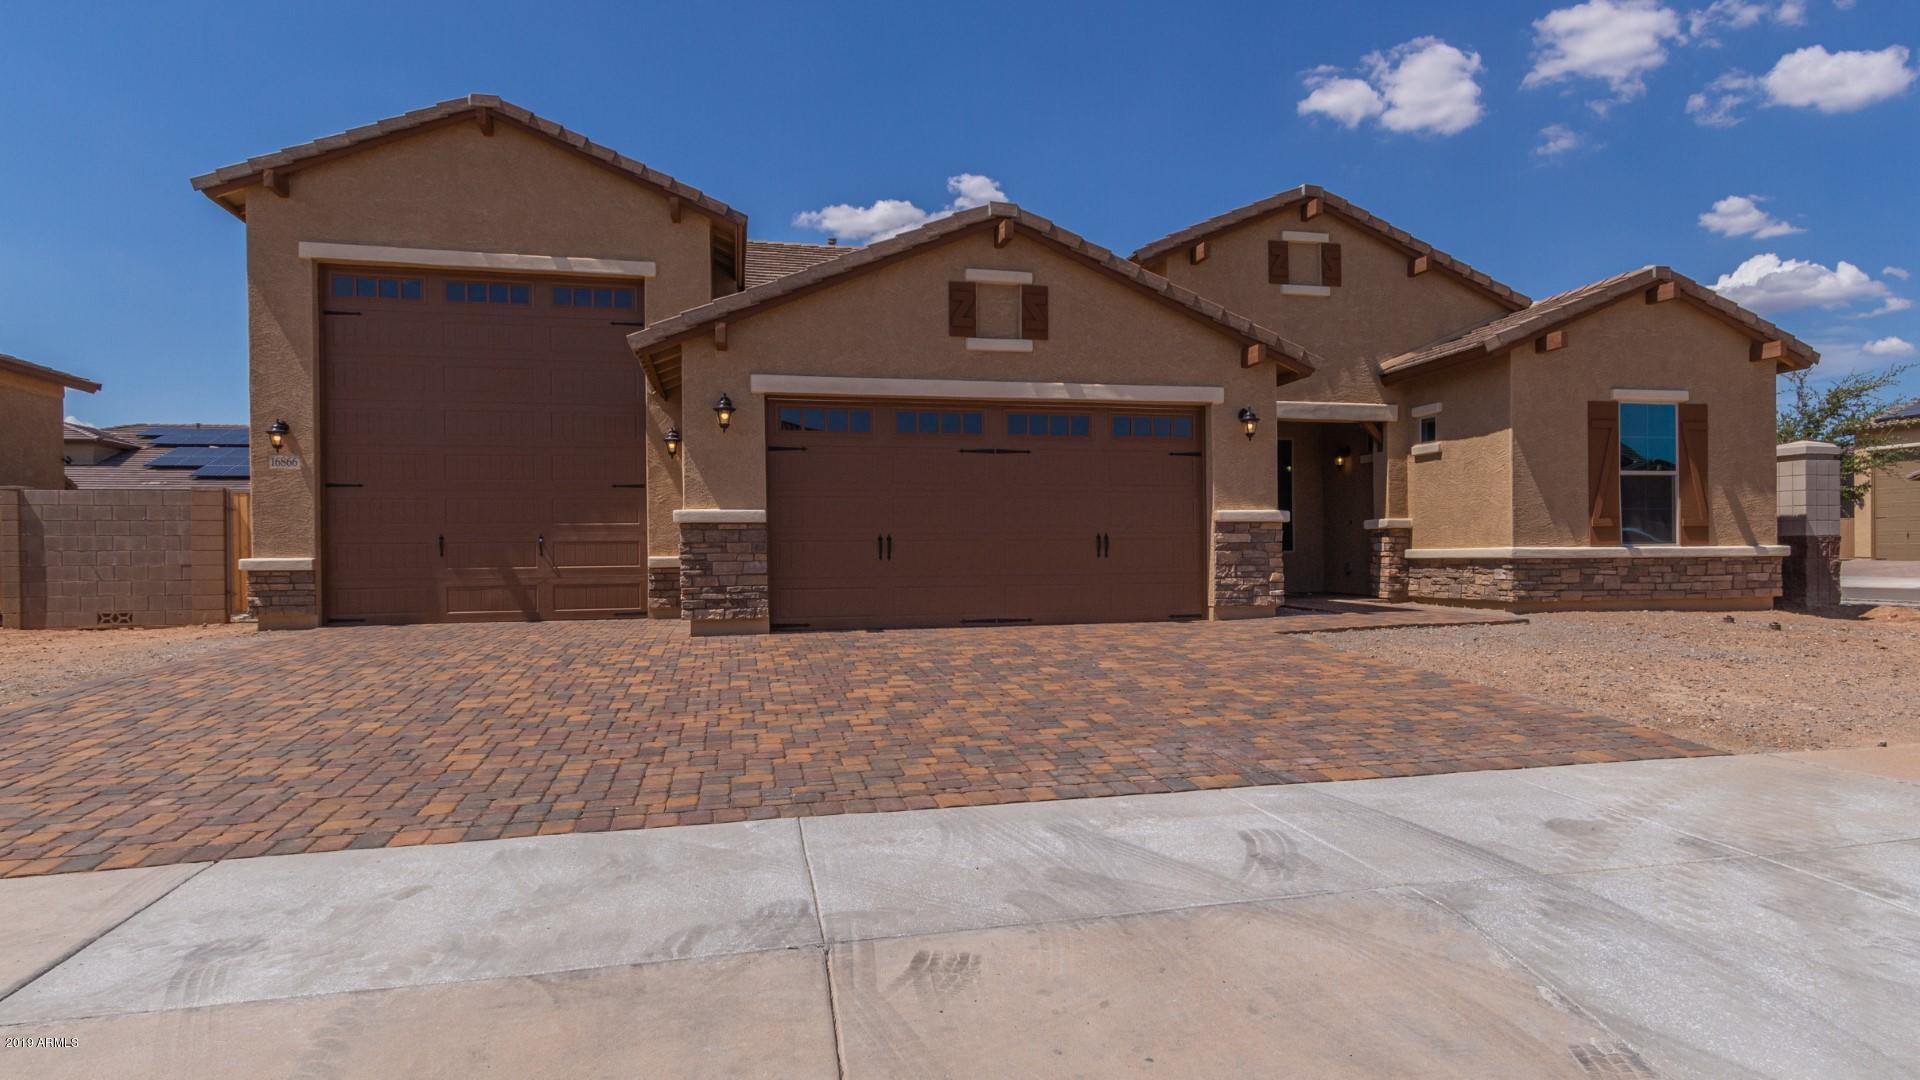 16866 W CIELO GRANDE Avenue, Surprise, Arizona